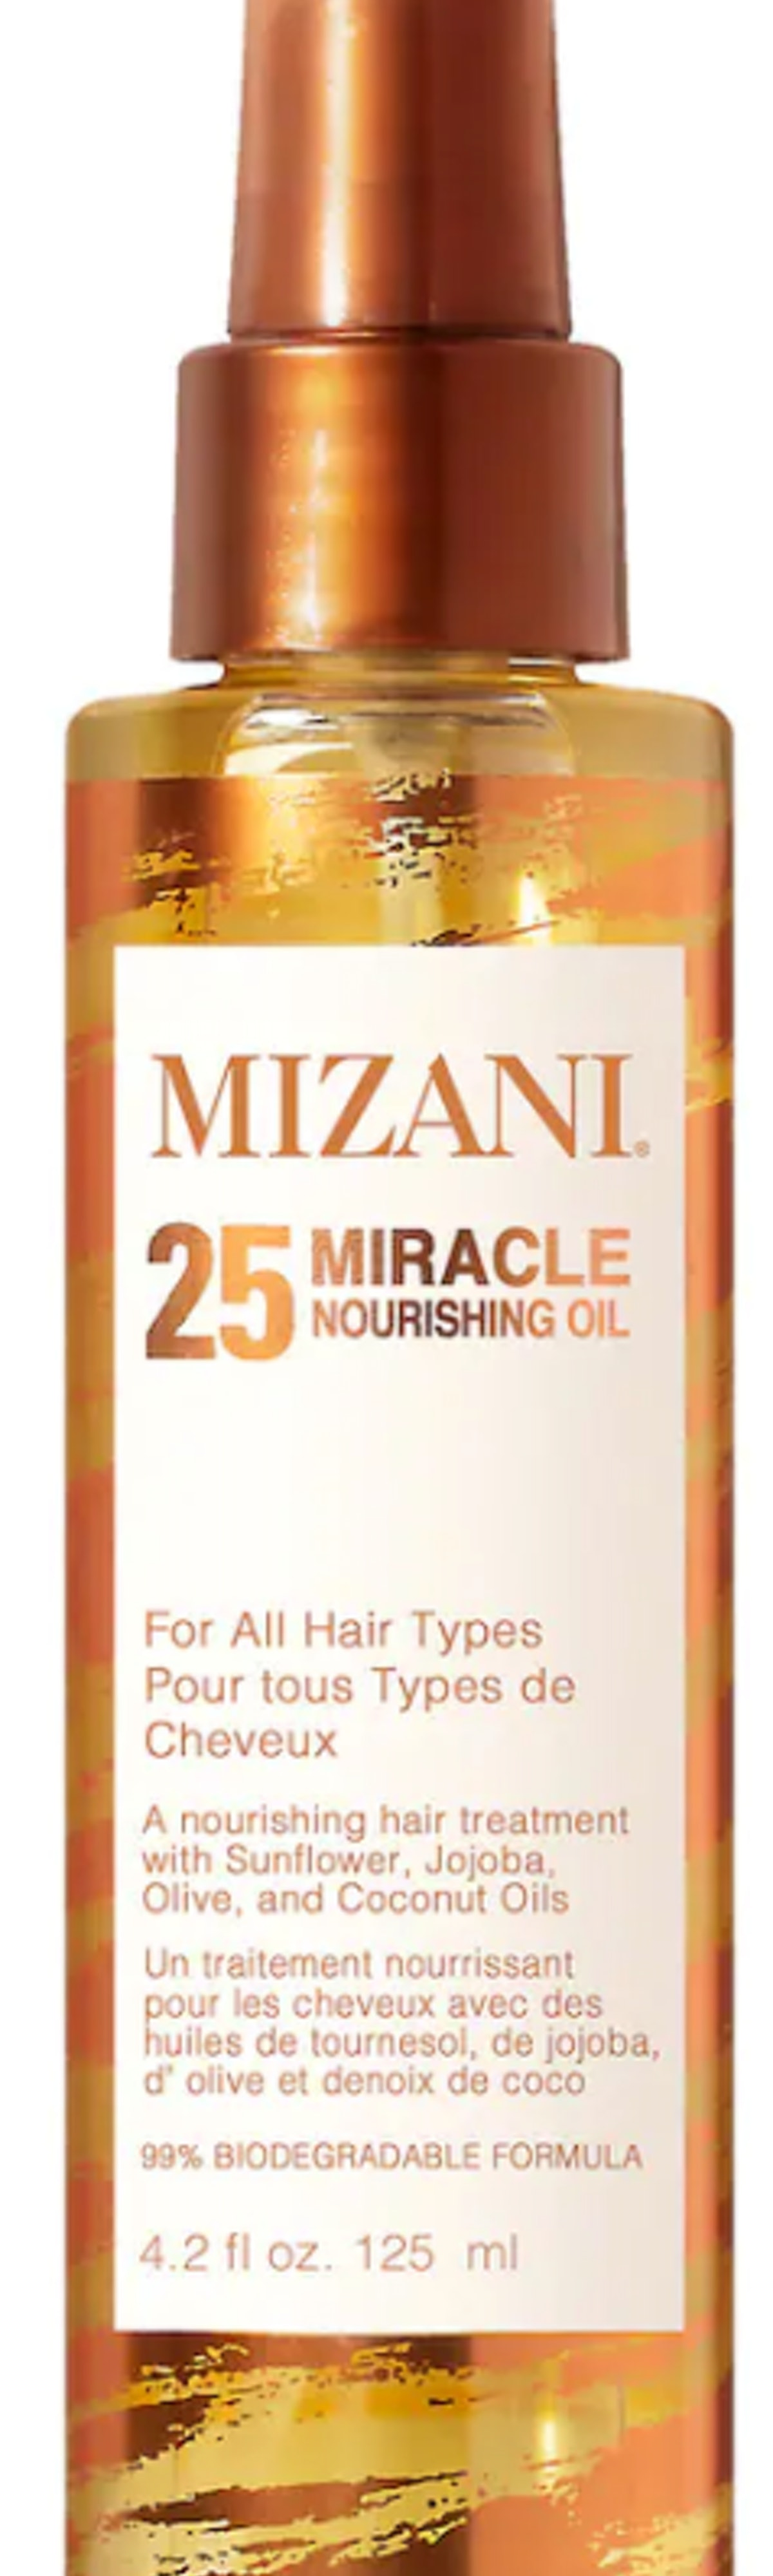 25 Miracle Nourishing Oil